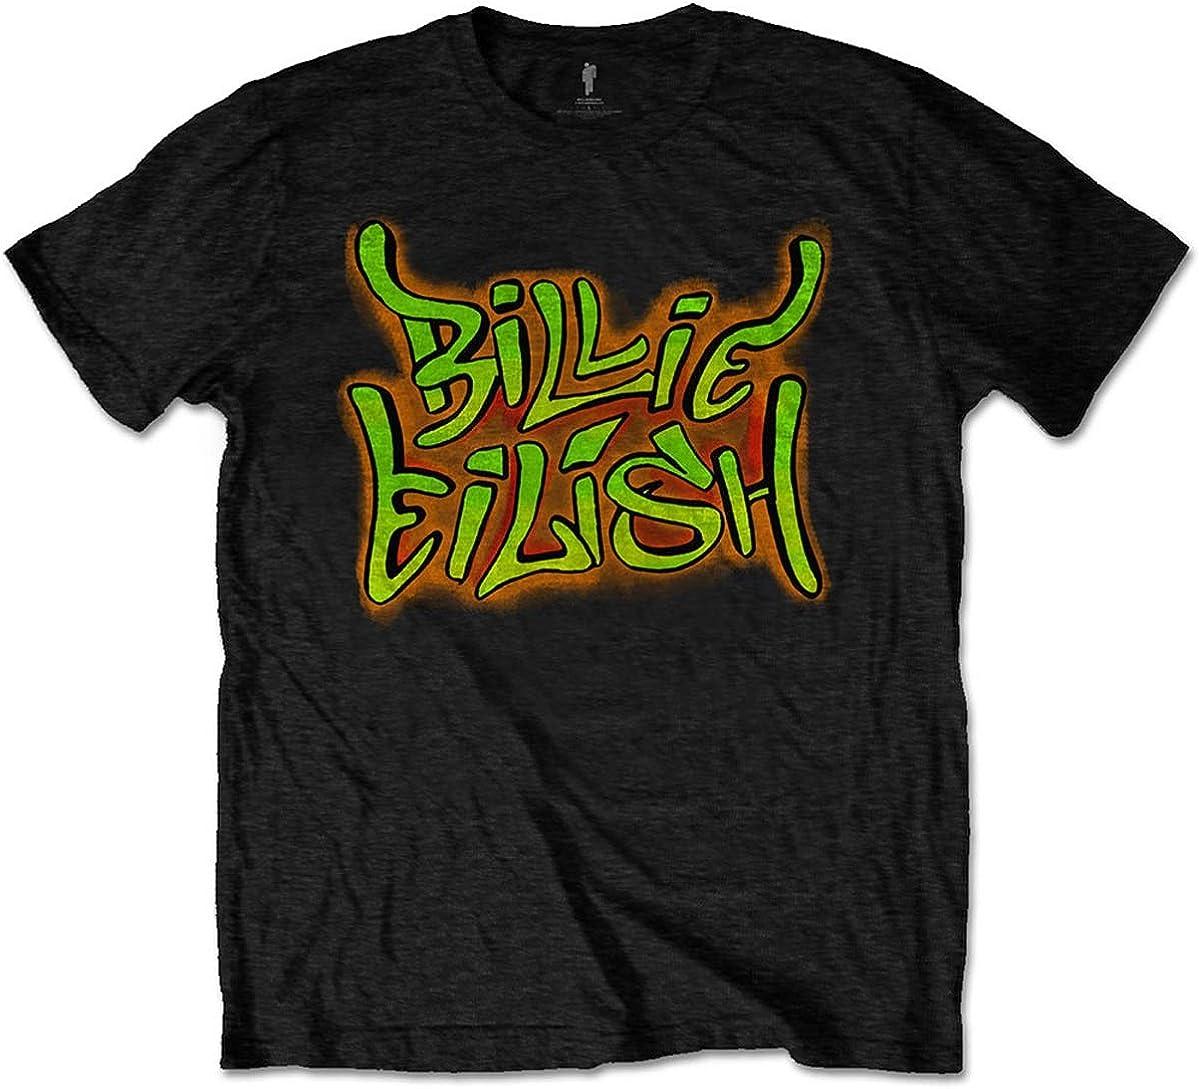 Billie Eilish Men's Graffiti New color T-Shirt Slim Free shipping on posting reviews Fit Black